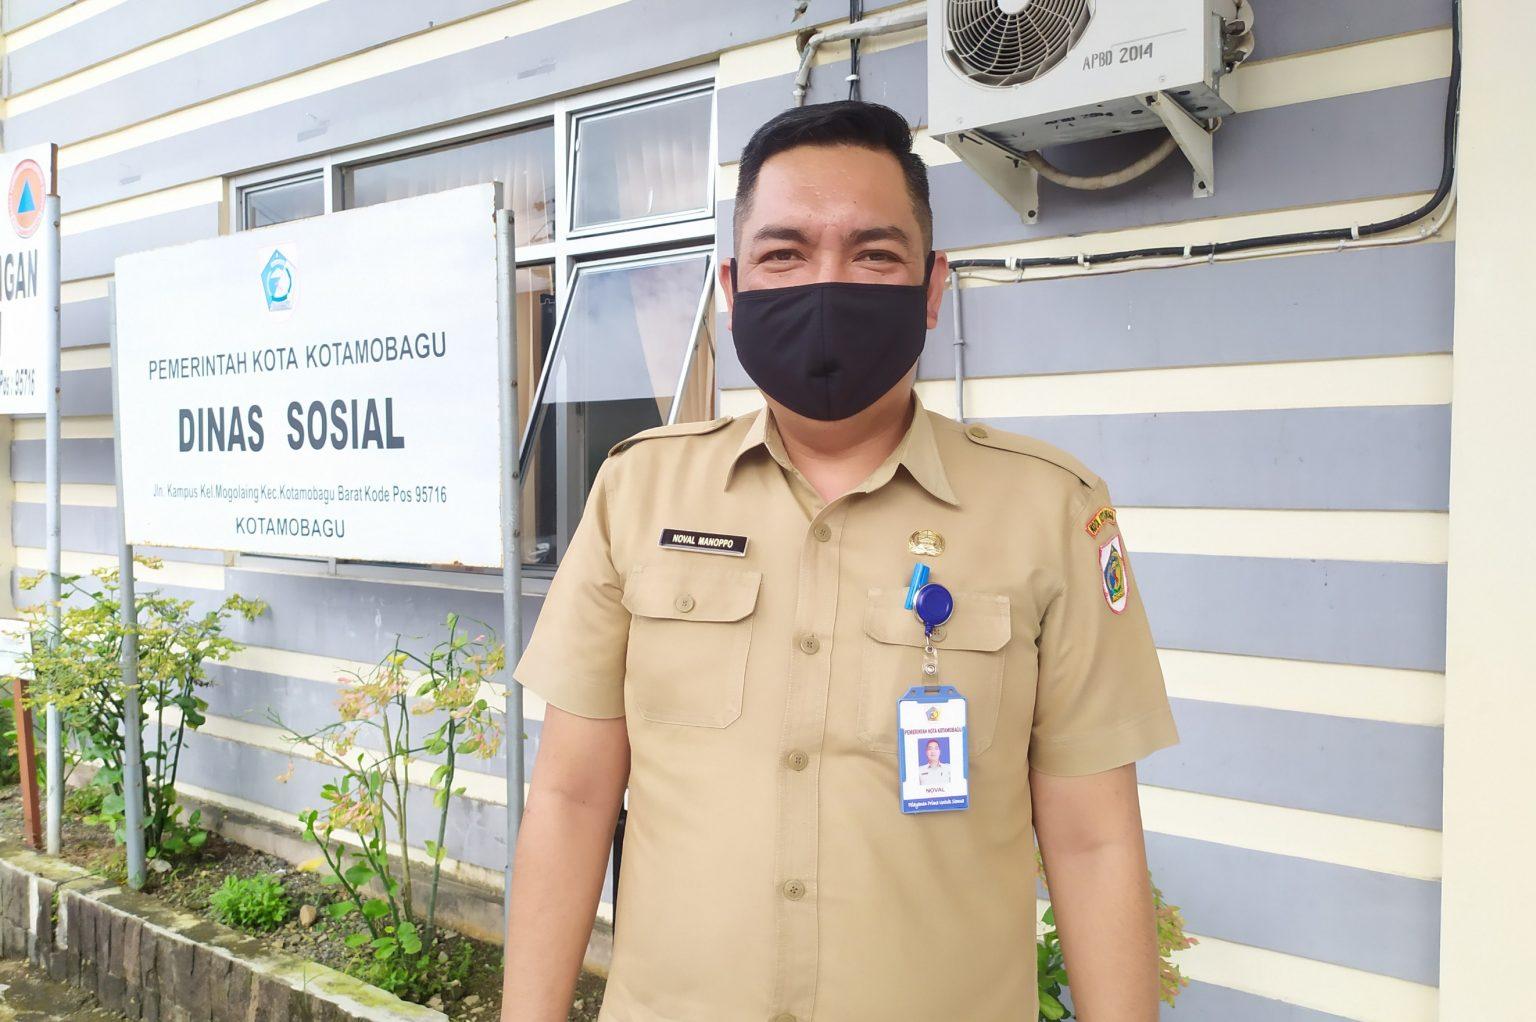 Kepala Dinas Sosial Kotamobagu, Noval Manoppo.